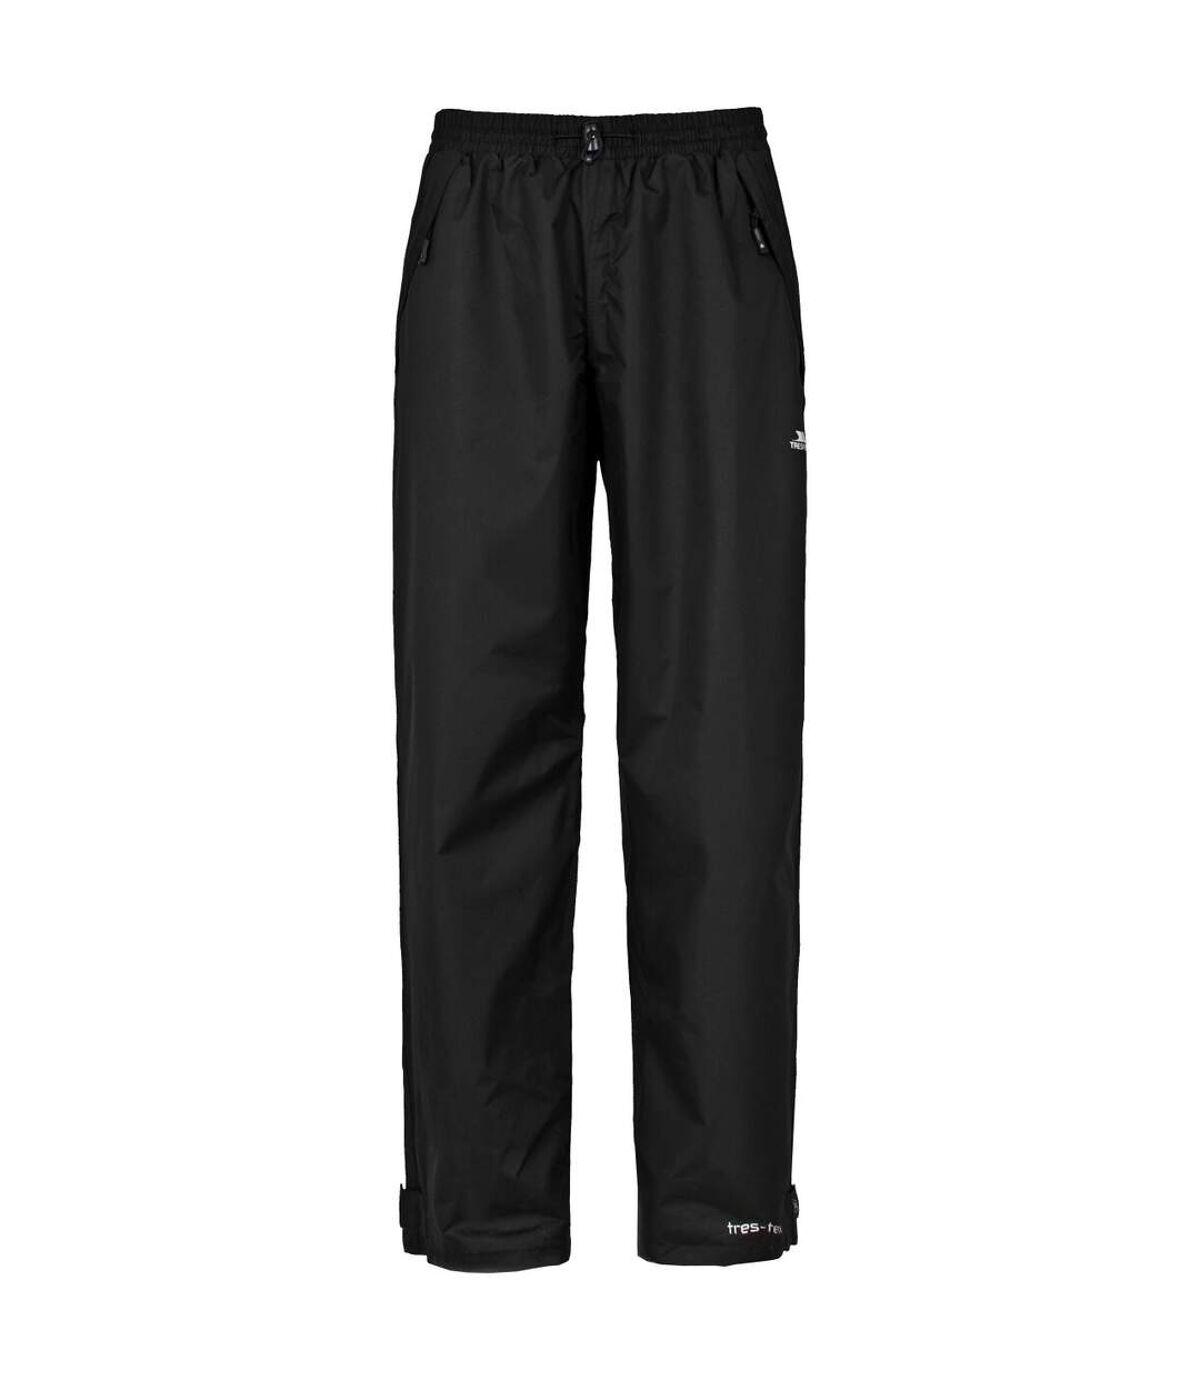 Trespass Mens Corvo Waterproof & Windproof Trousers (Black) - UTTP222